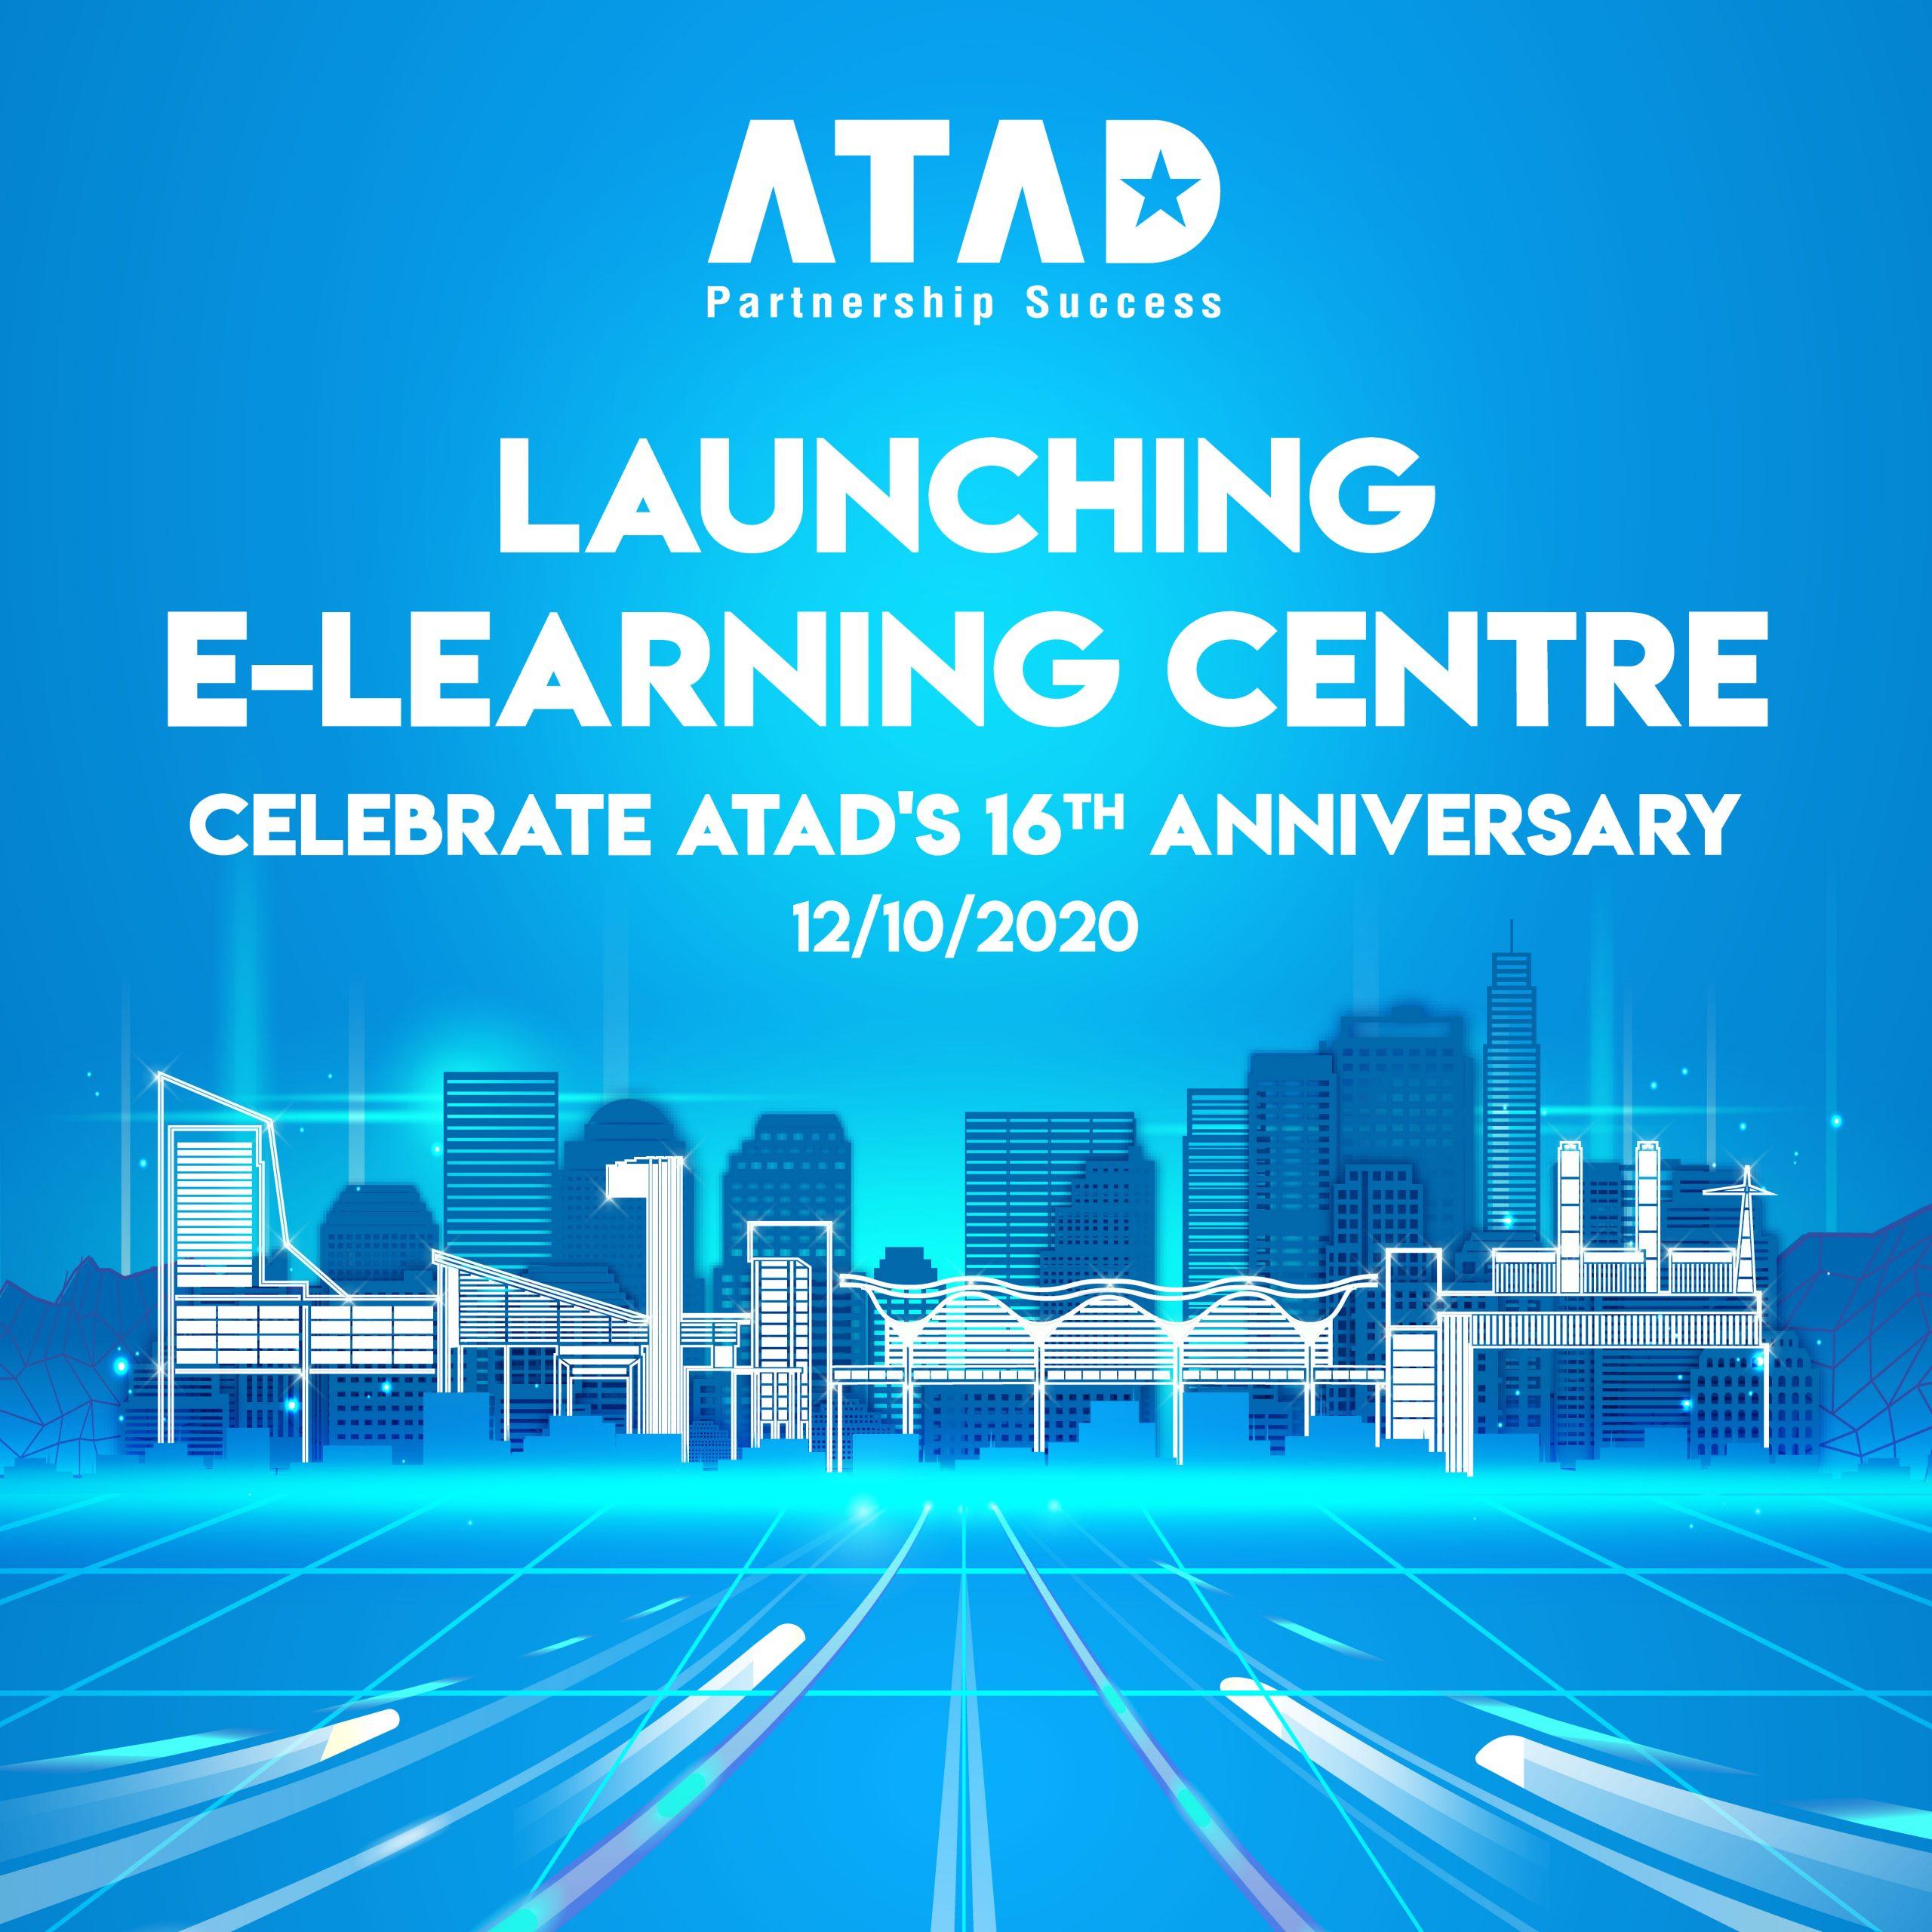 ATAD launch E-Learning Centre